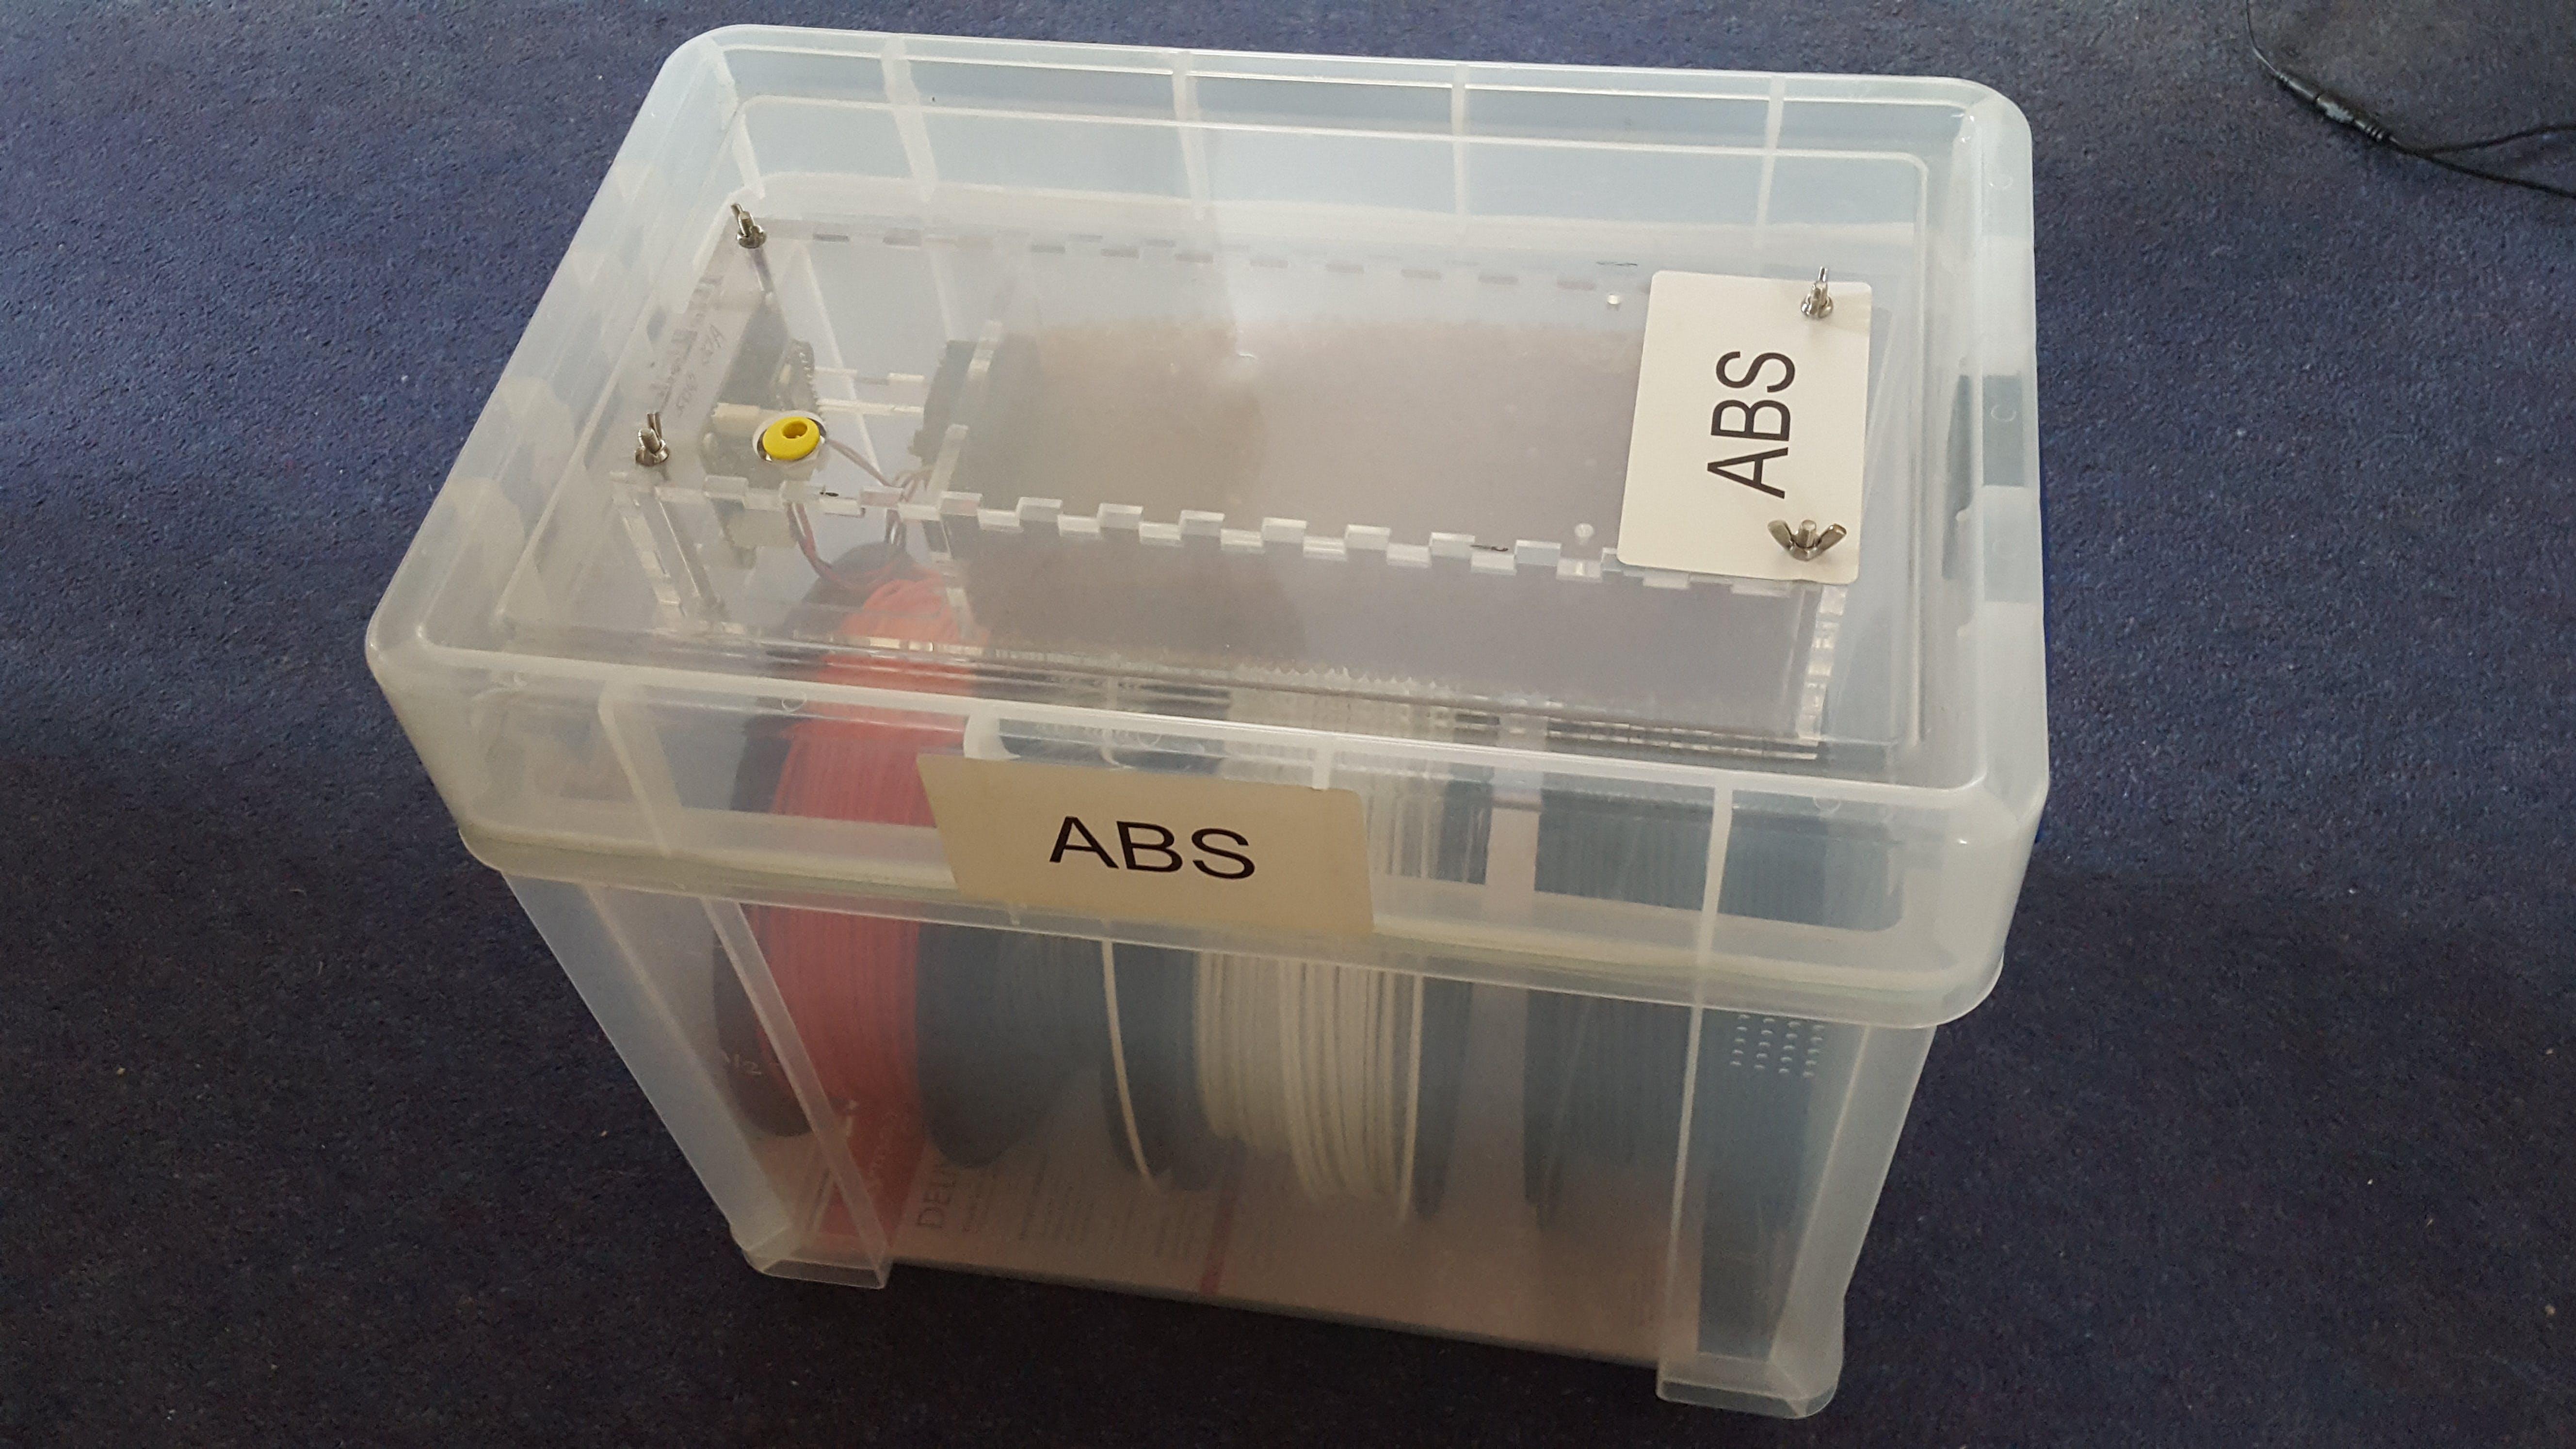 3D Printer filament storage box